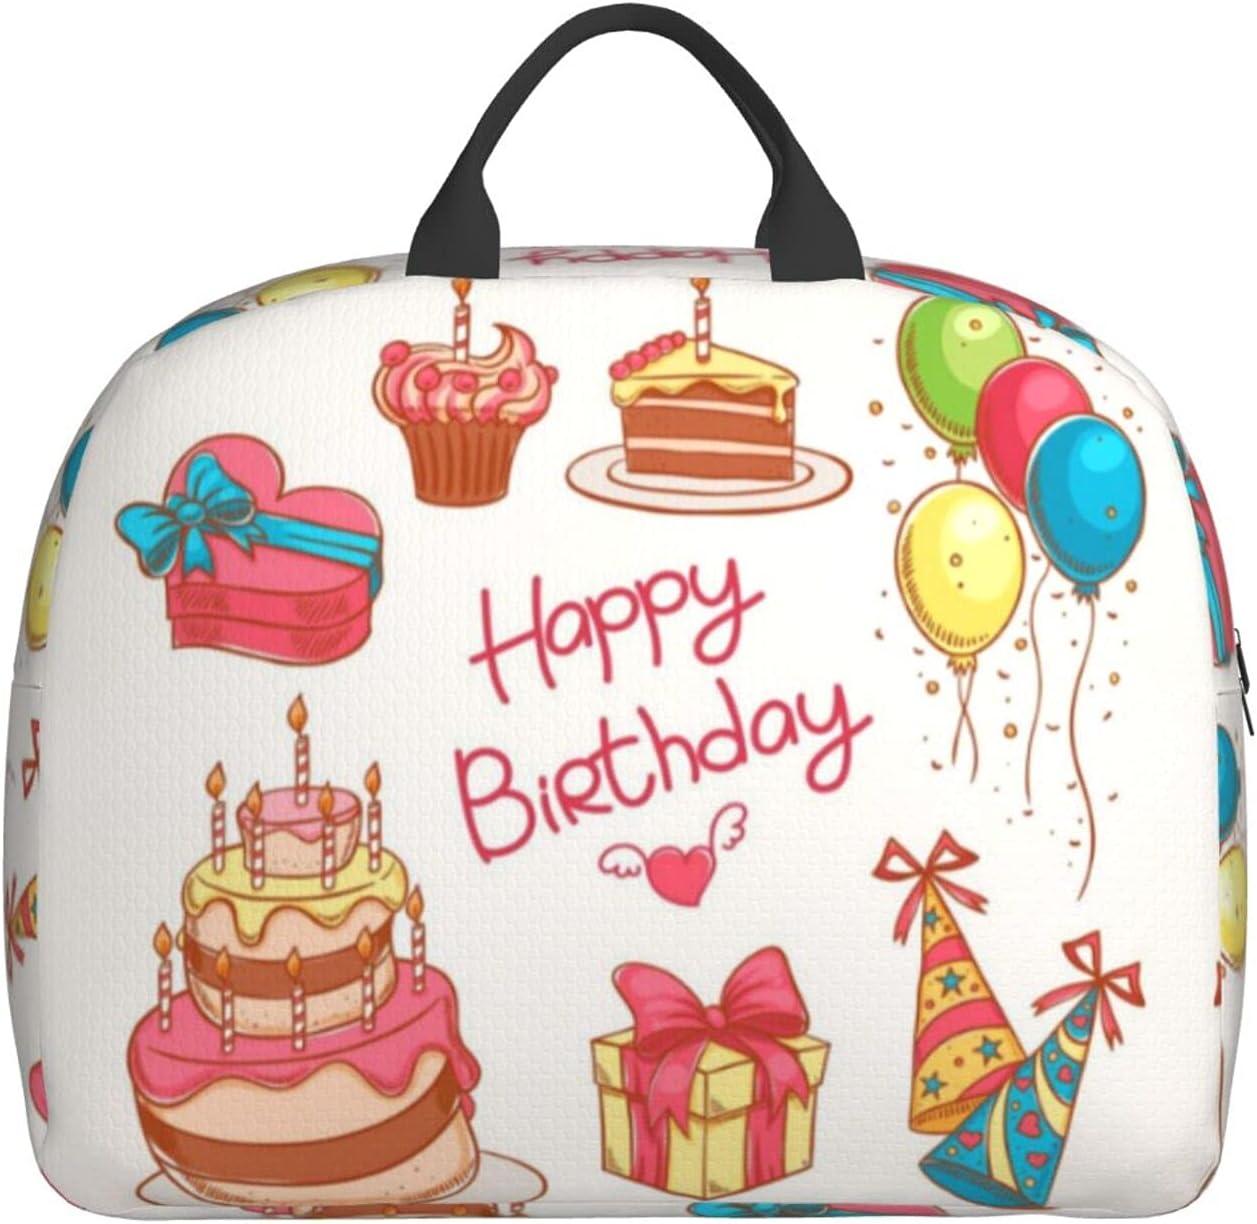 Folding Travel Duffel Bag Happy Birthday Carry Gifts Ranking TOP6 Wat Cake On Boston Mall